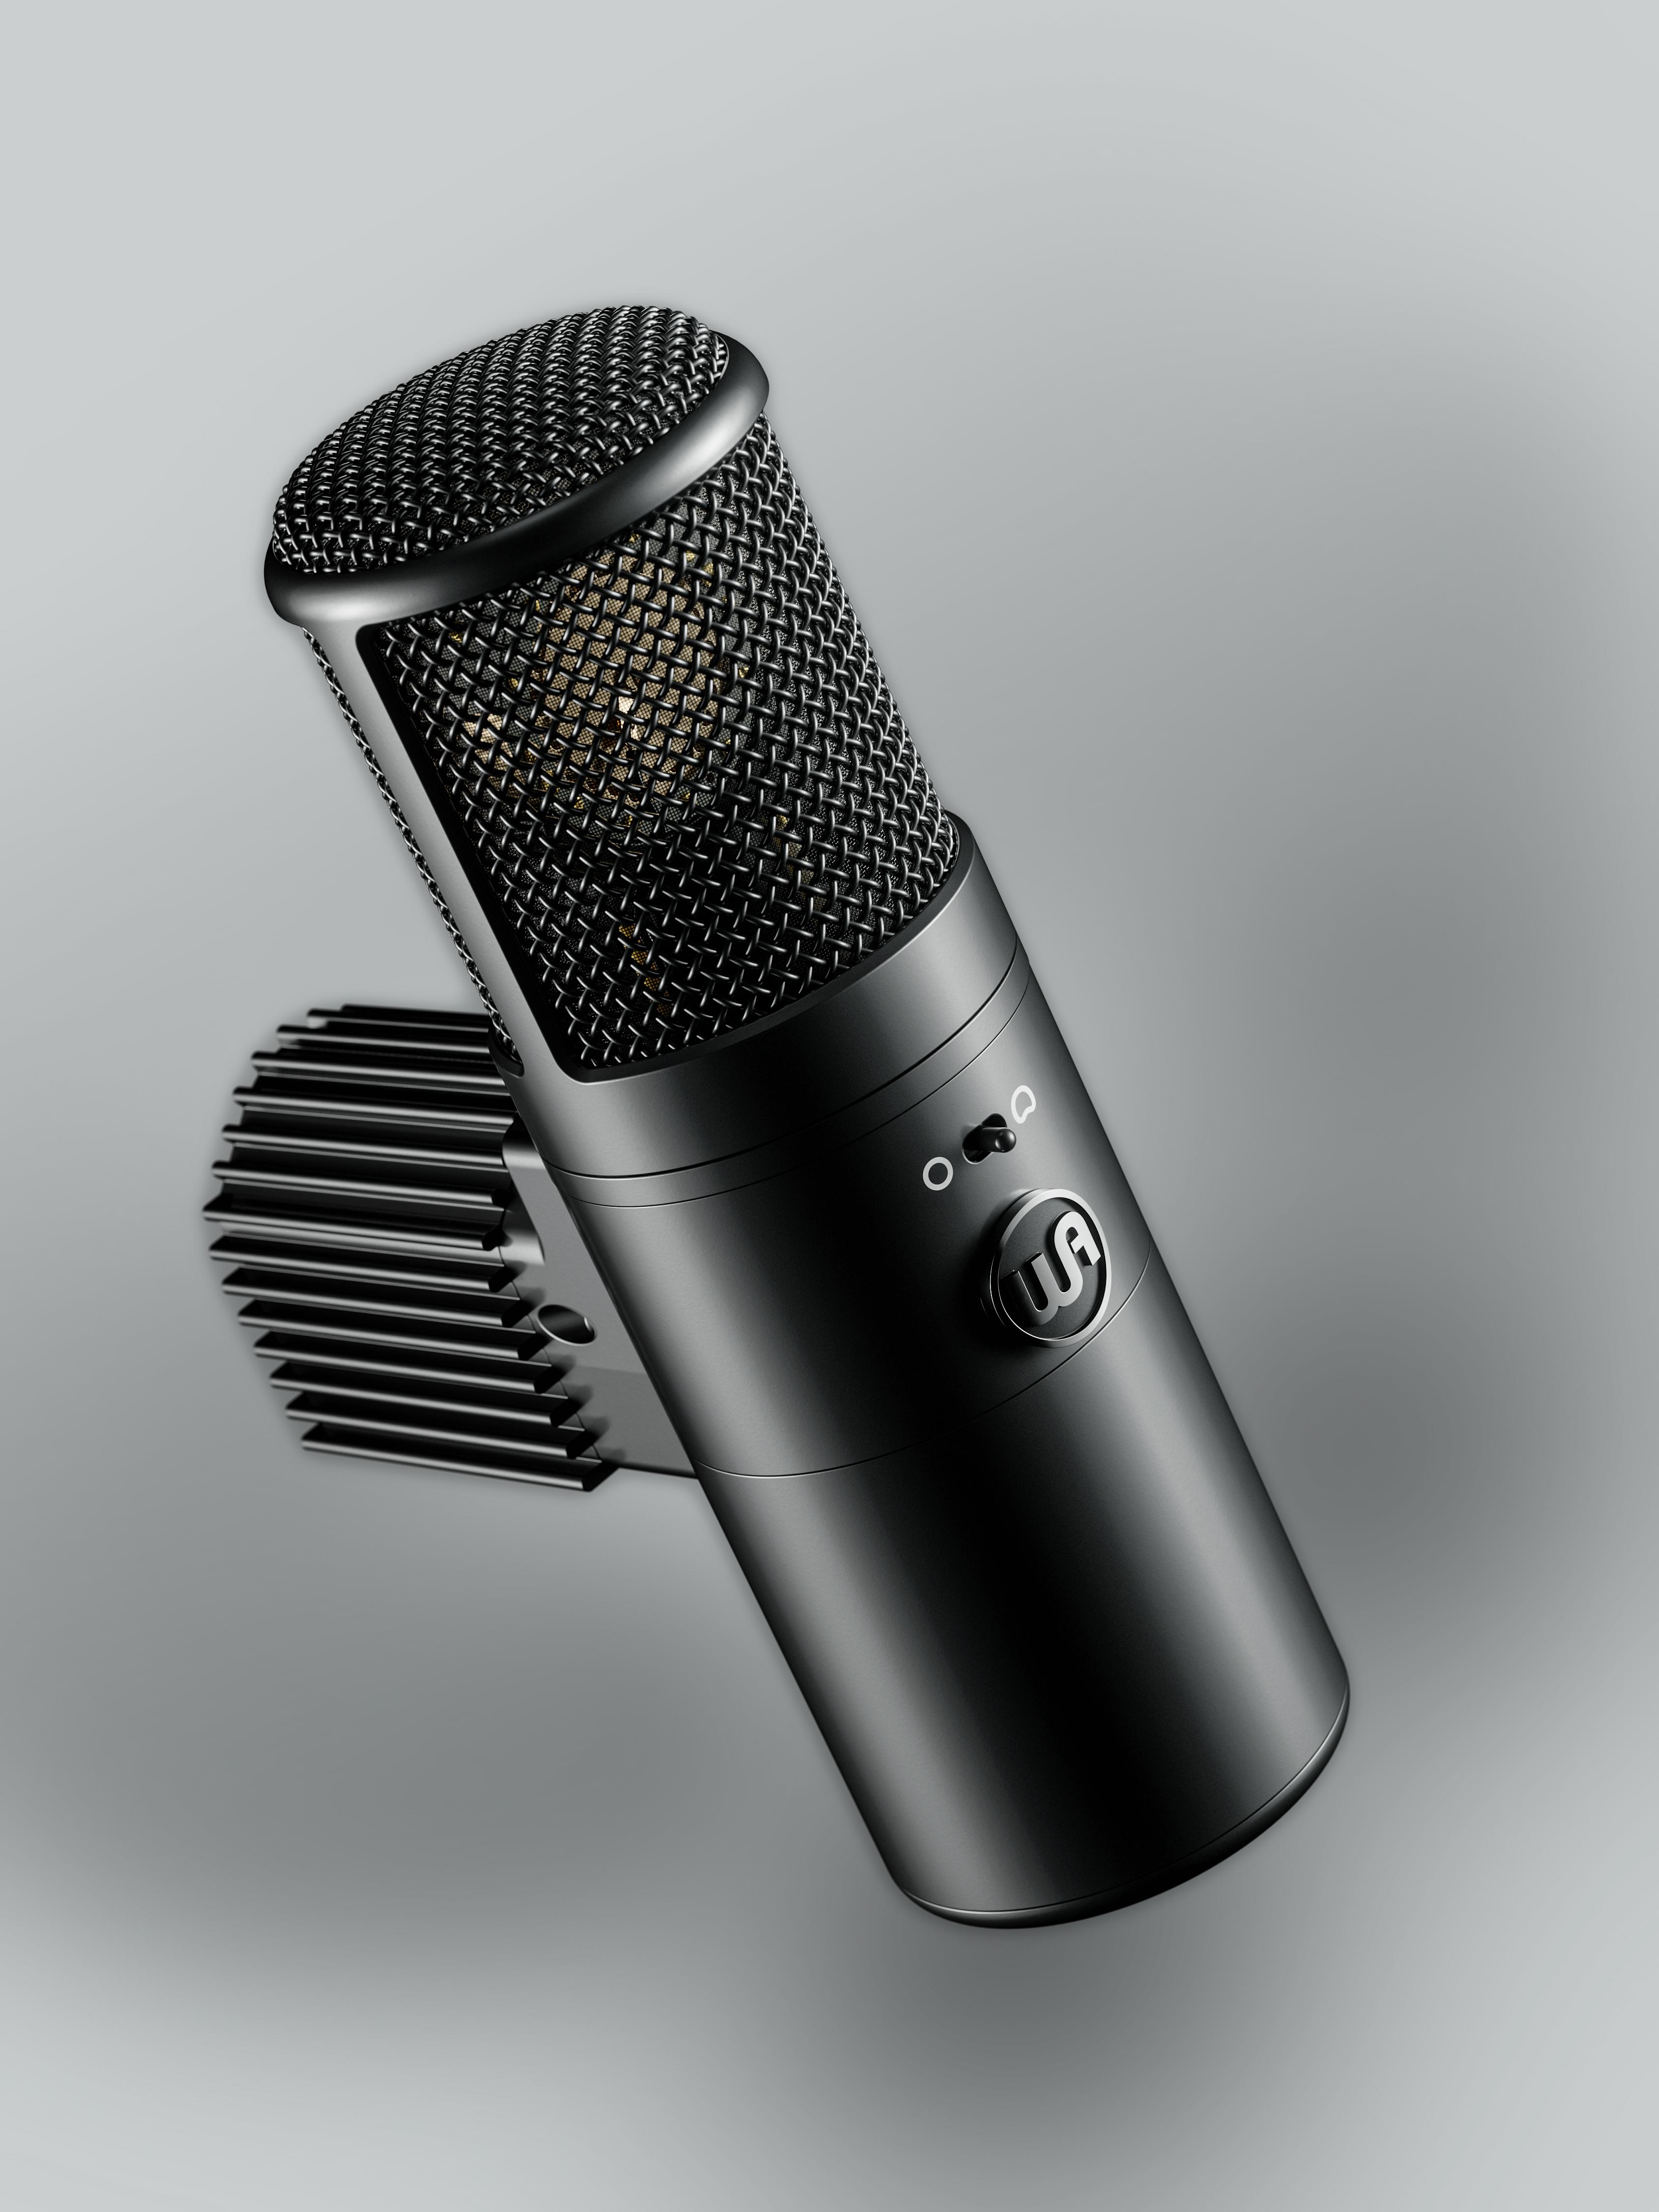 Warm Audio WA-8000 Large-Diaphragm Multipattern Tube Condenser Microphone